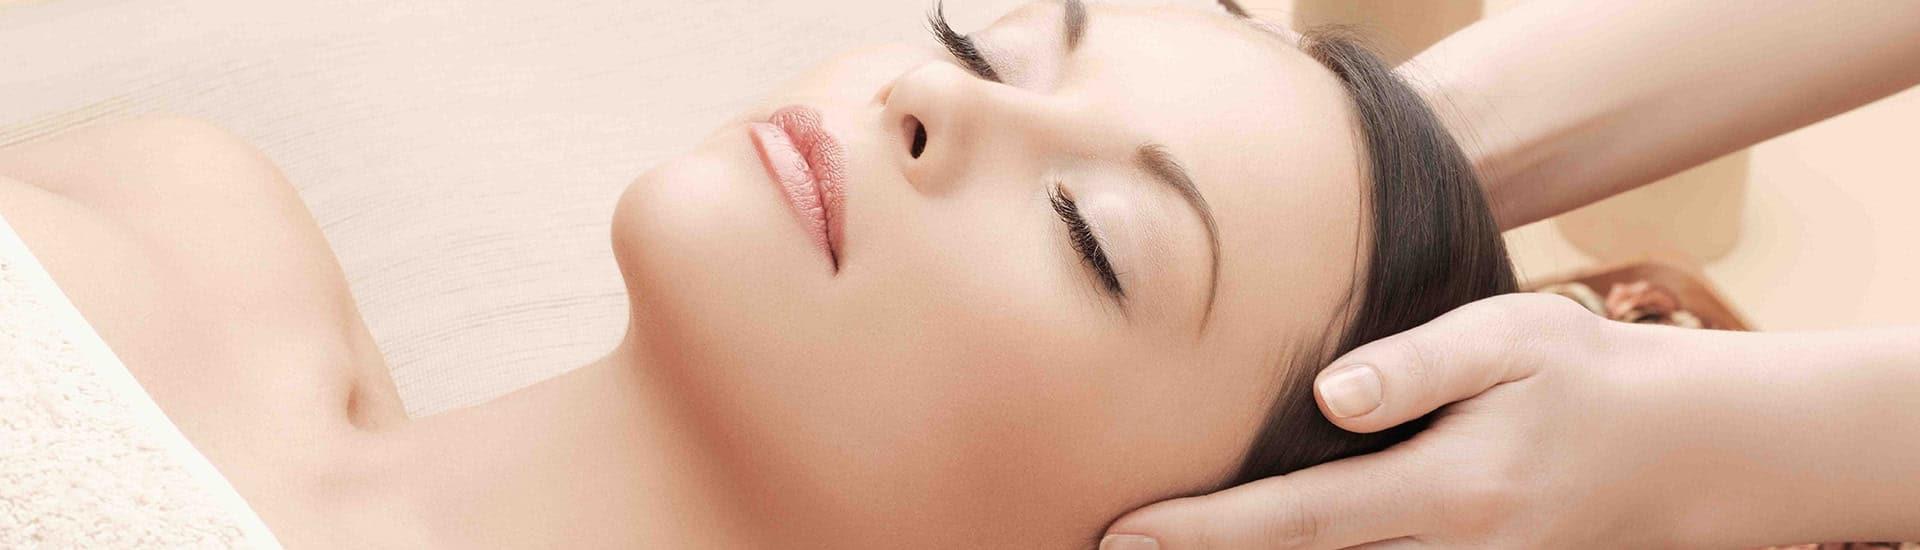 erotic massage utrecht body to body massage belgie